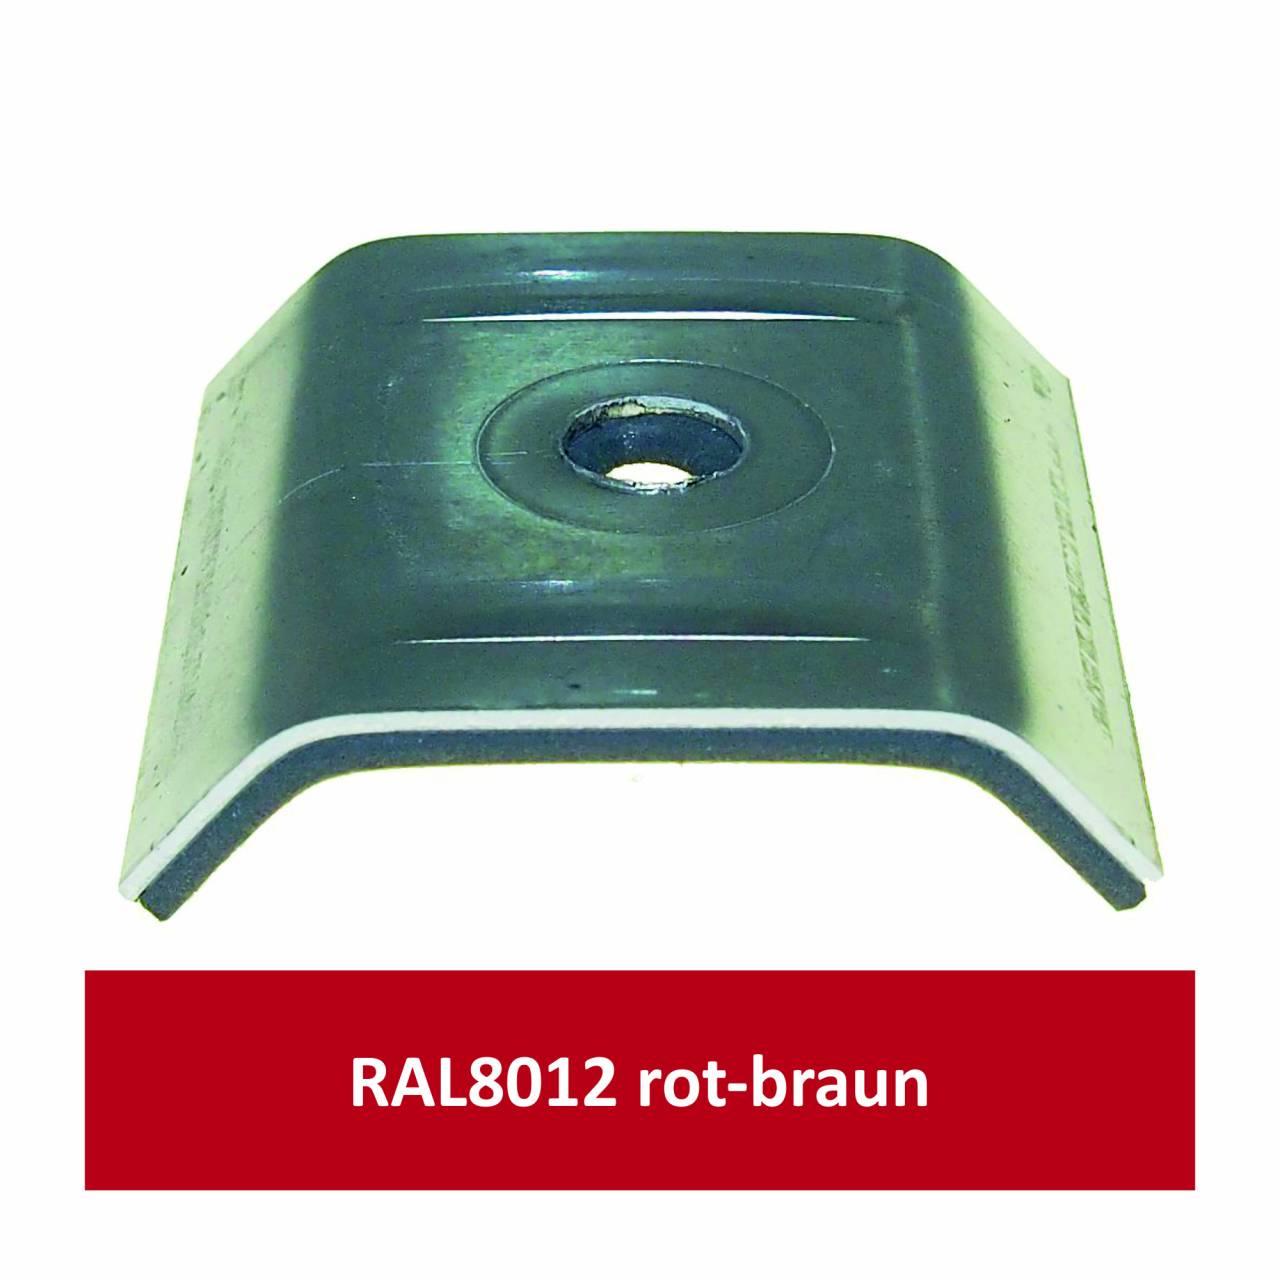 Kalotten für 39/333, Alu RAL8012 rotbraun/ Pck a 100 Stück